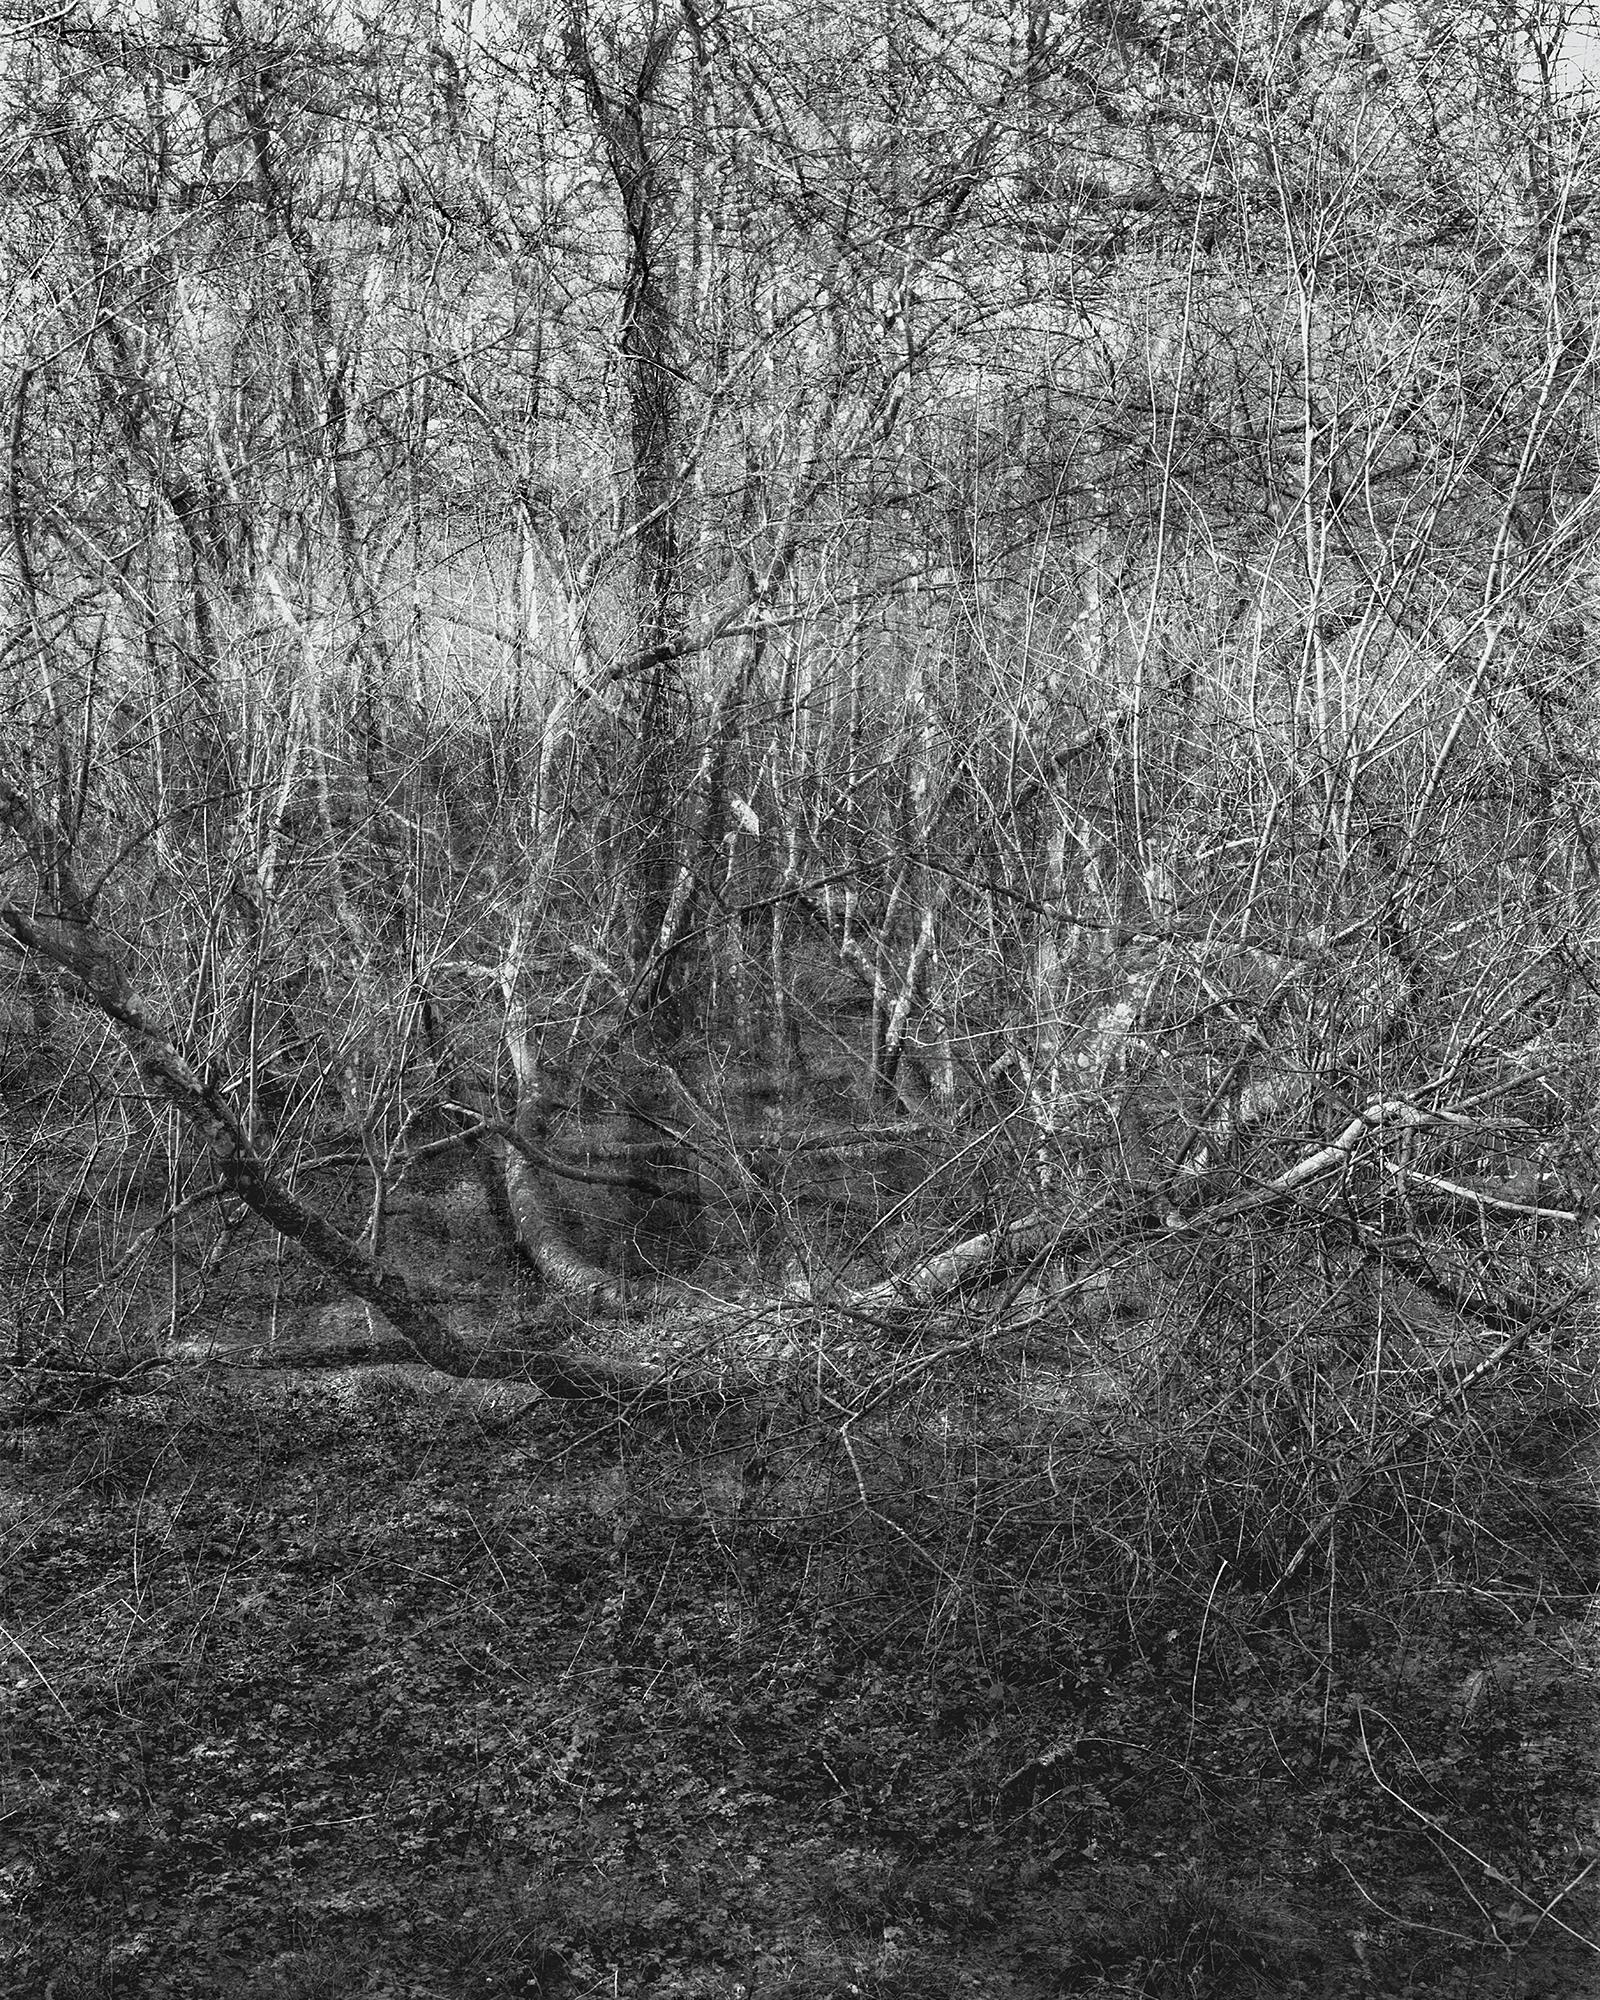 Photograph: Jonty Sale, 'SQUALLSMIRE #9'